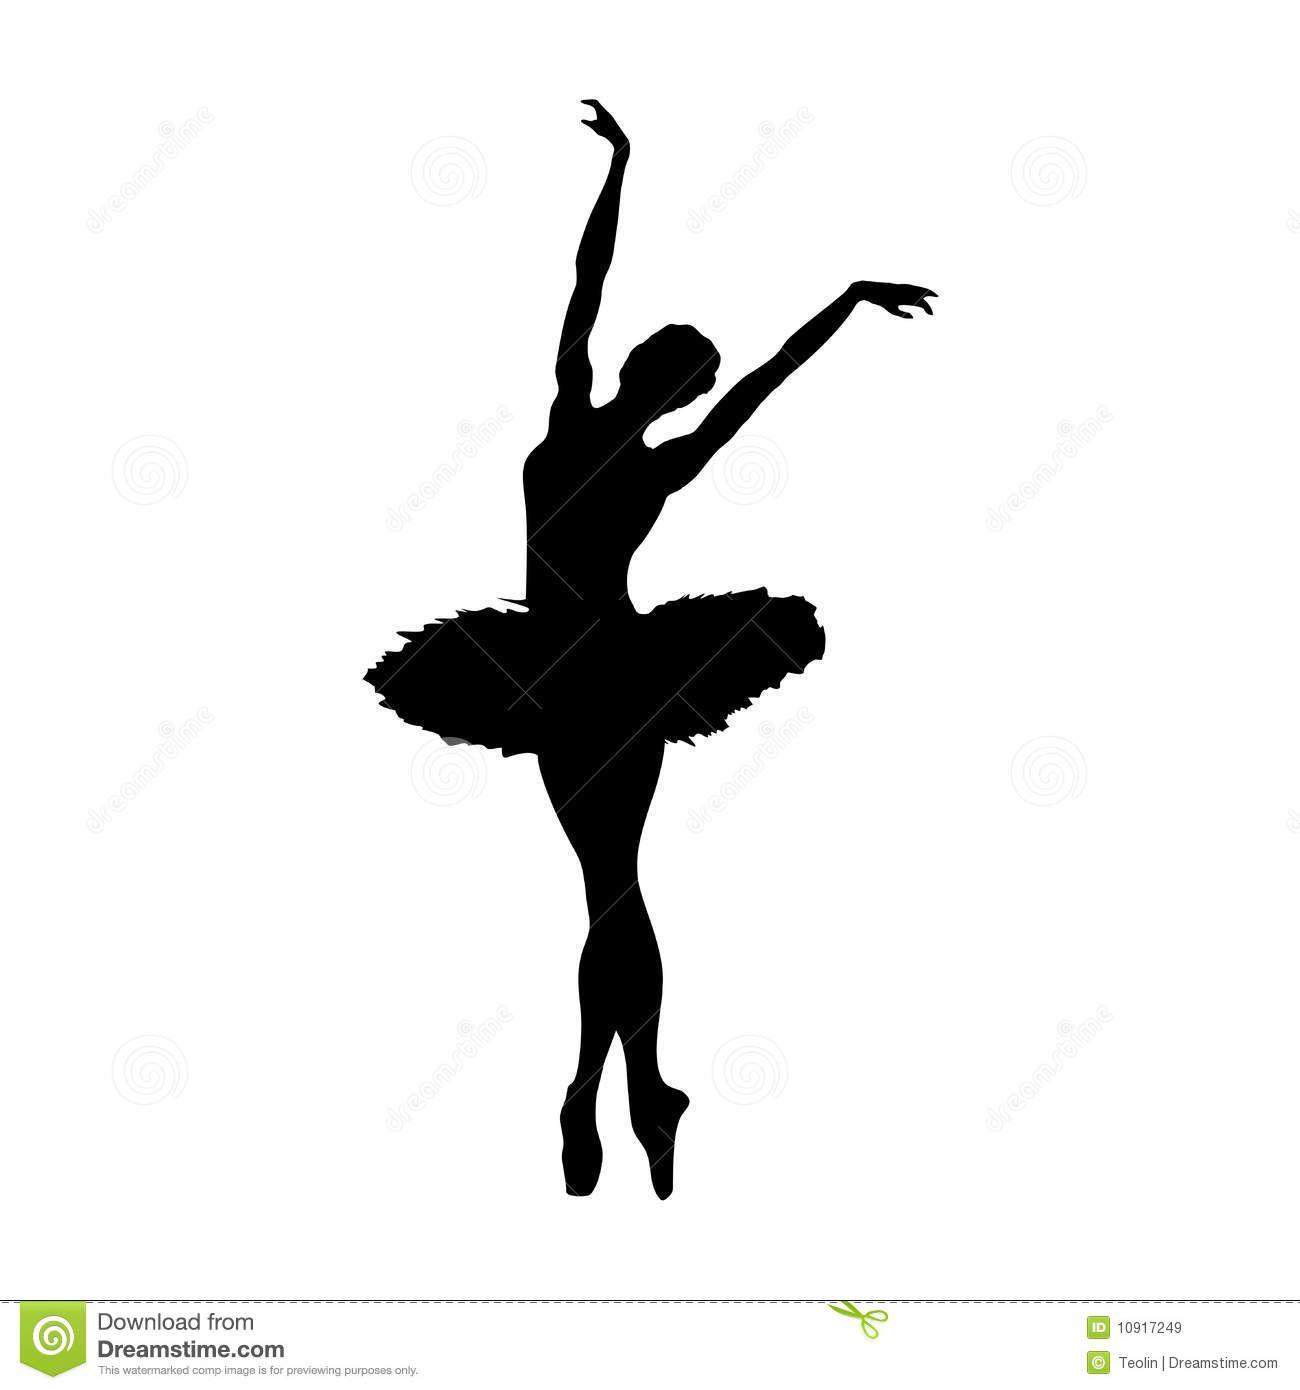 Ballerina clipart arabesque. Image result for silhouette